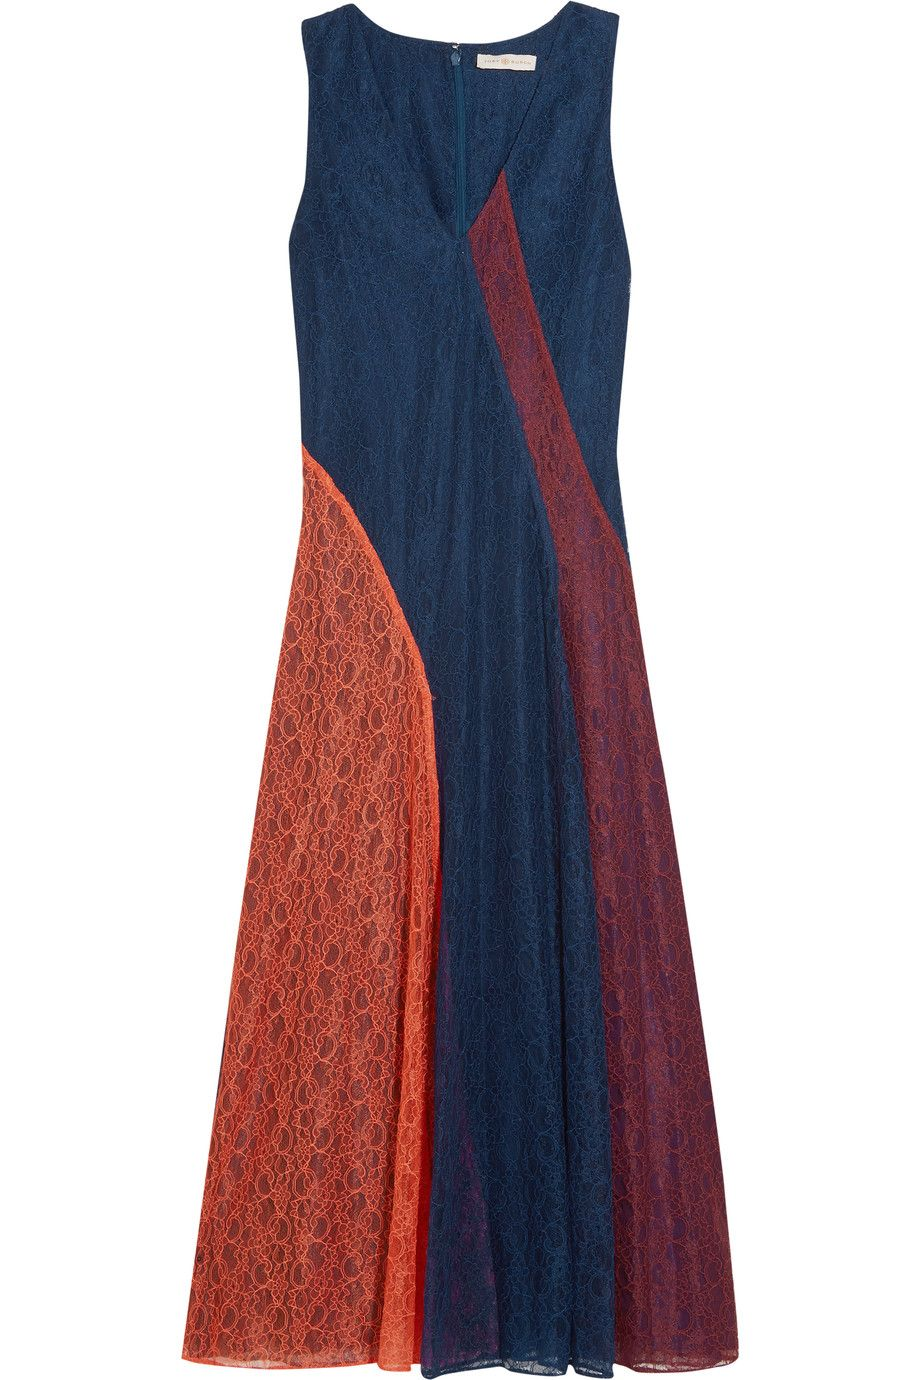 TORY BURCH . #toryburch #cloth #dress